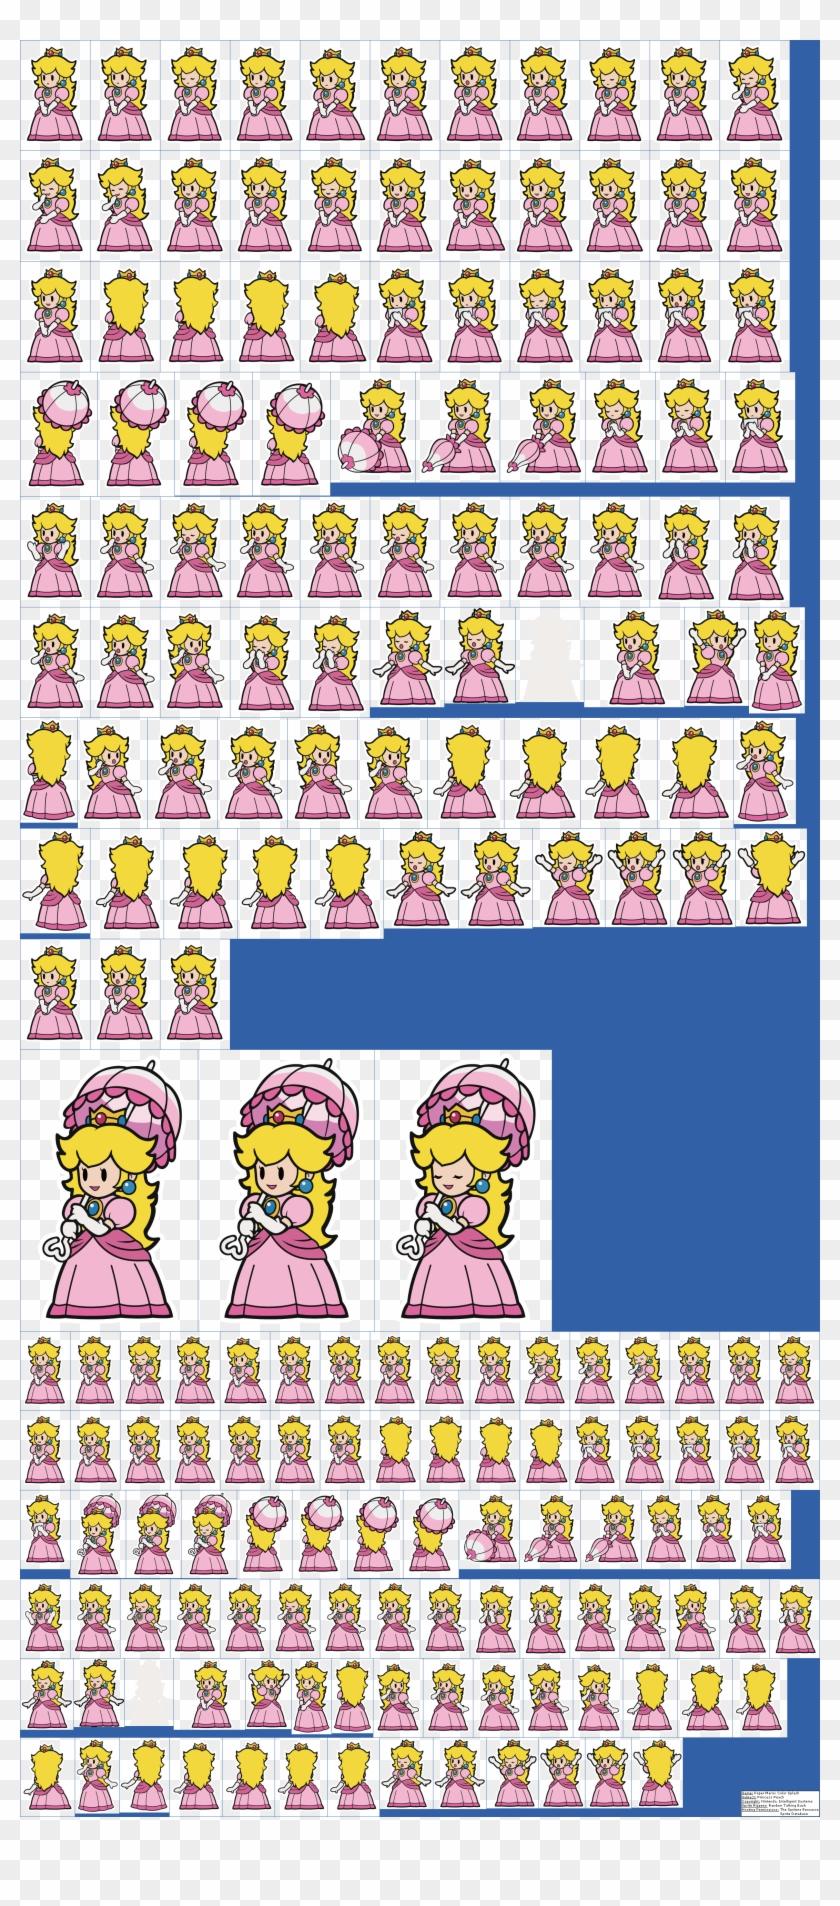 Princess Peach Clipart Wii U Paper Mario Color Splash